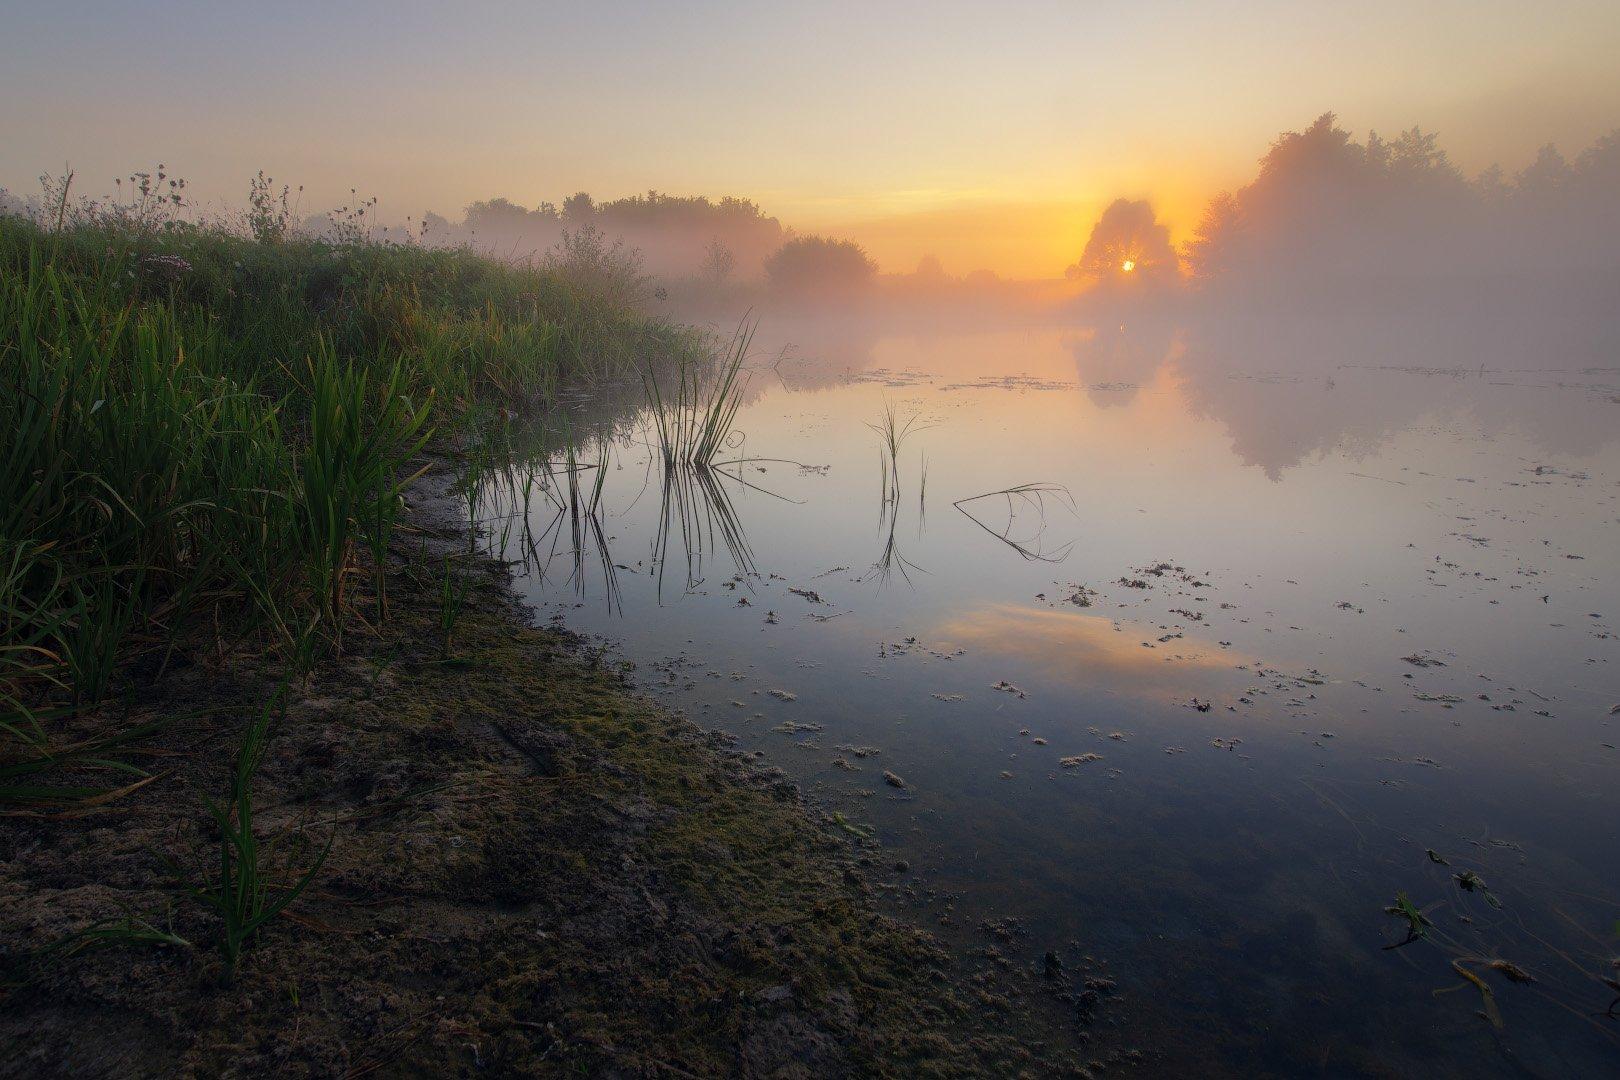 река, солнце, туман, утро, рассвет, волчья, river, sun, fog, morning, dawn, Виктор Тулбанов